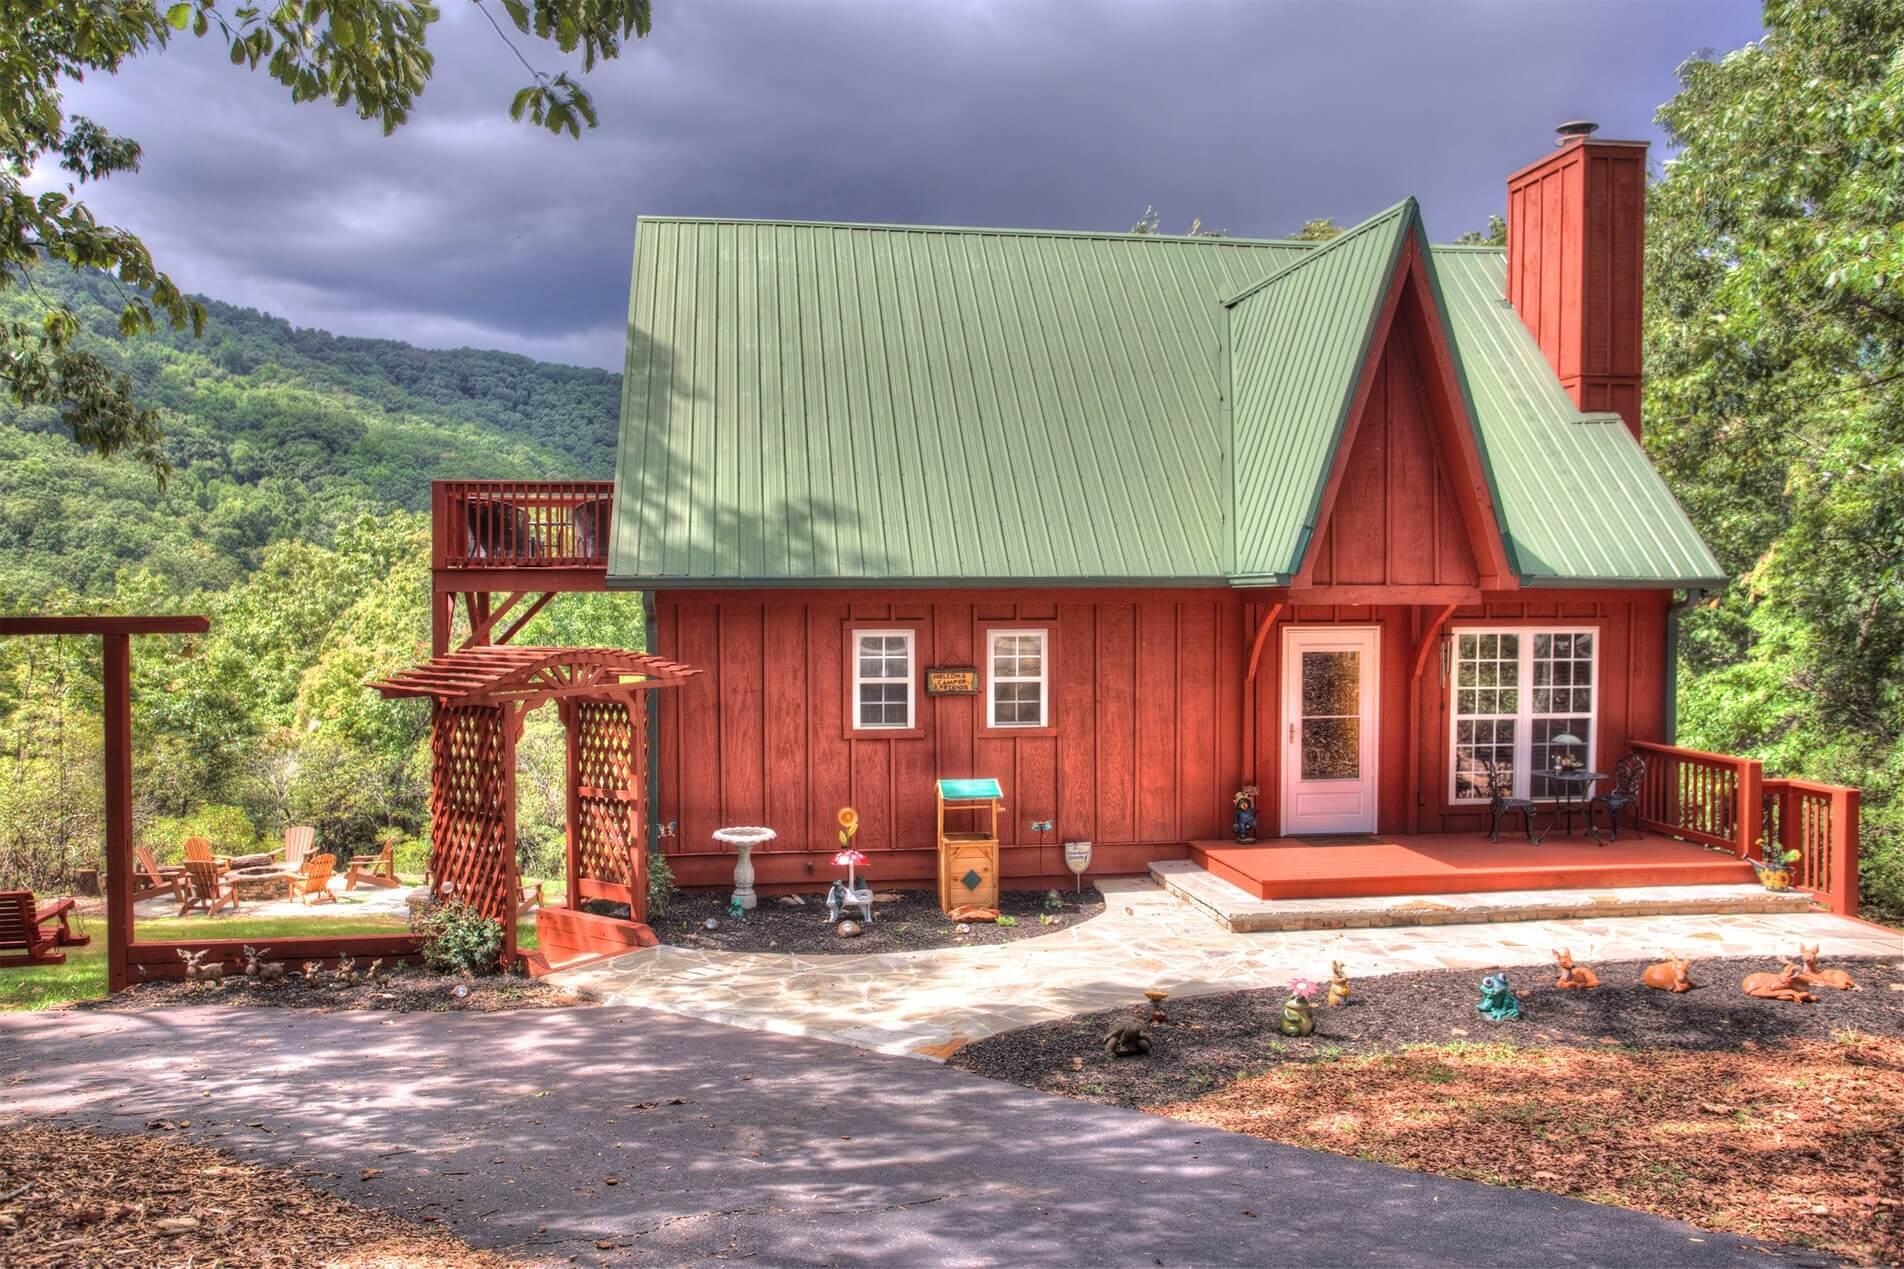 georgia ga helen tray mtn rd estate real cabins northeast cabin mountain rentals property